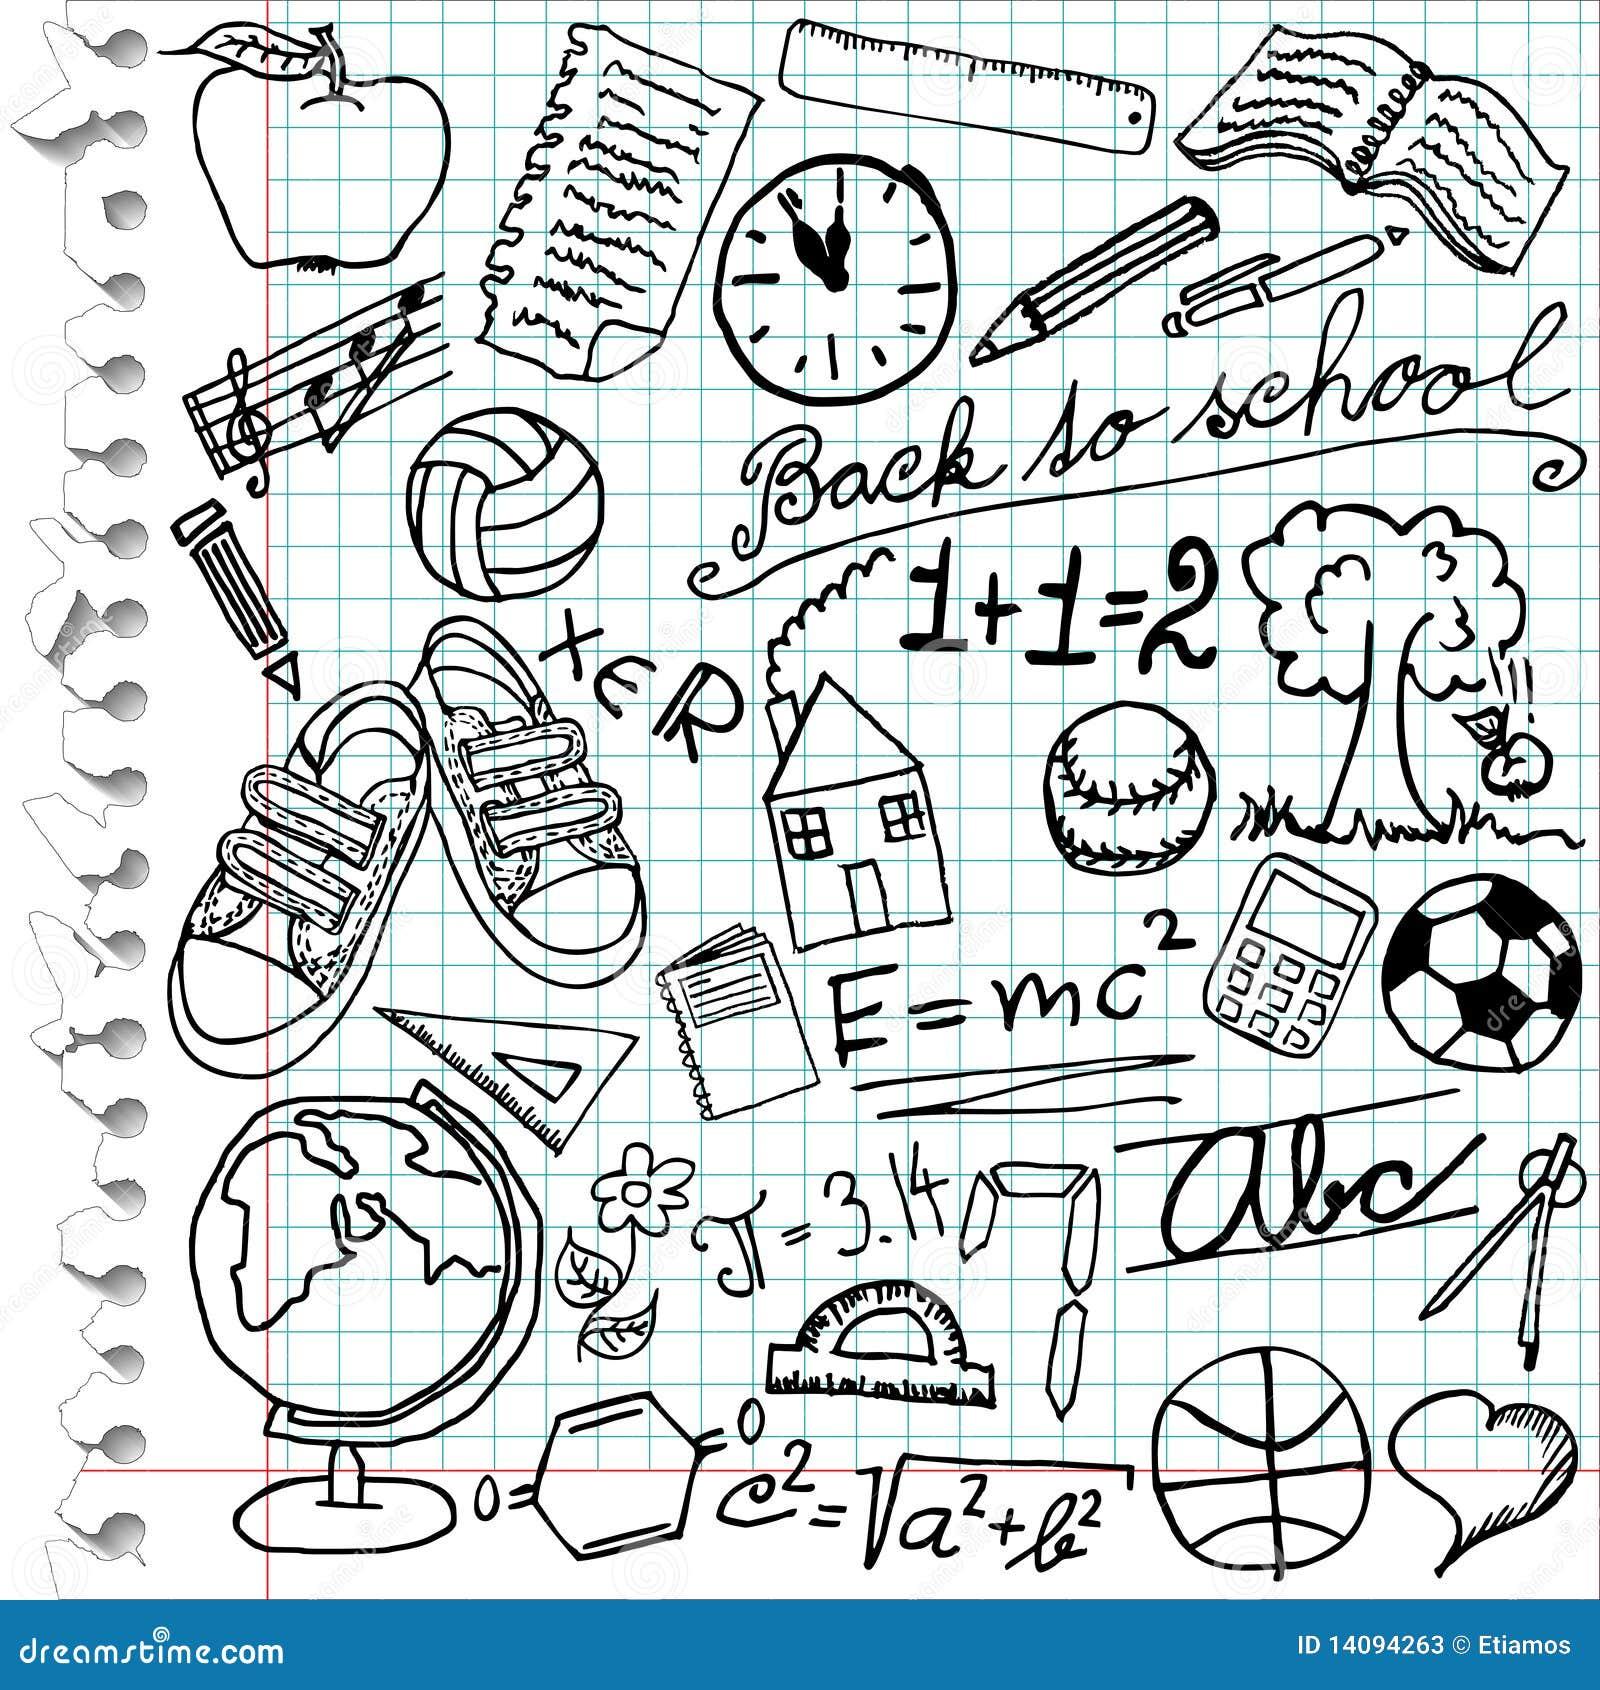 School symbols stock vector illustration of basketball 14094263 school symbols buycottarizona Image collections